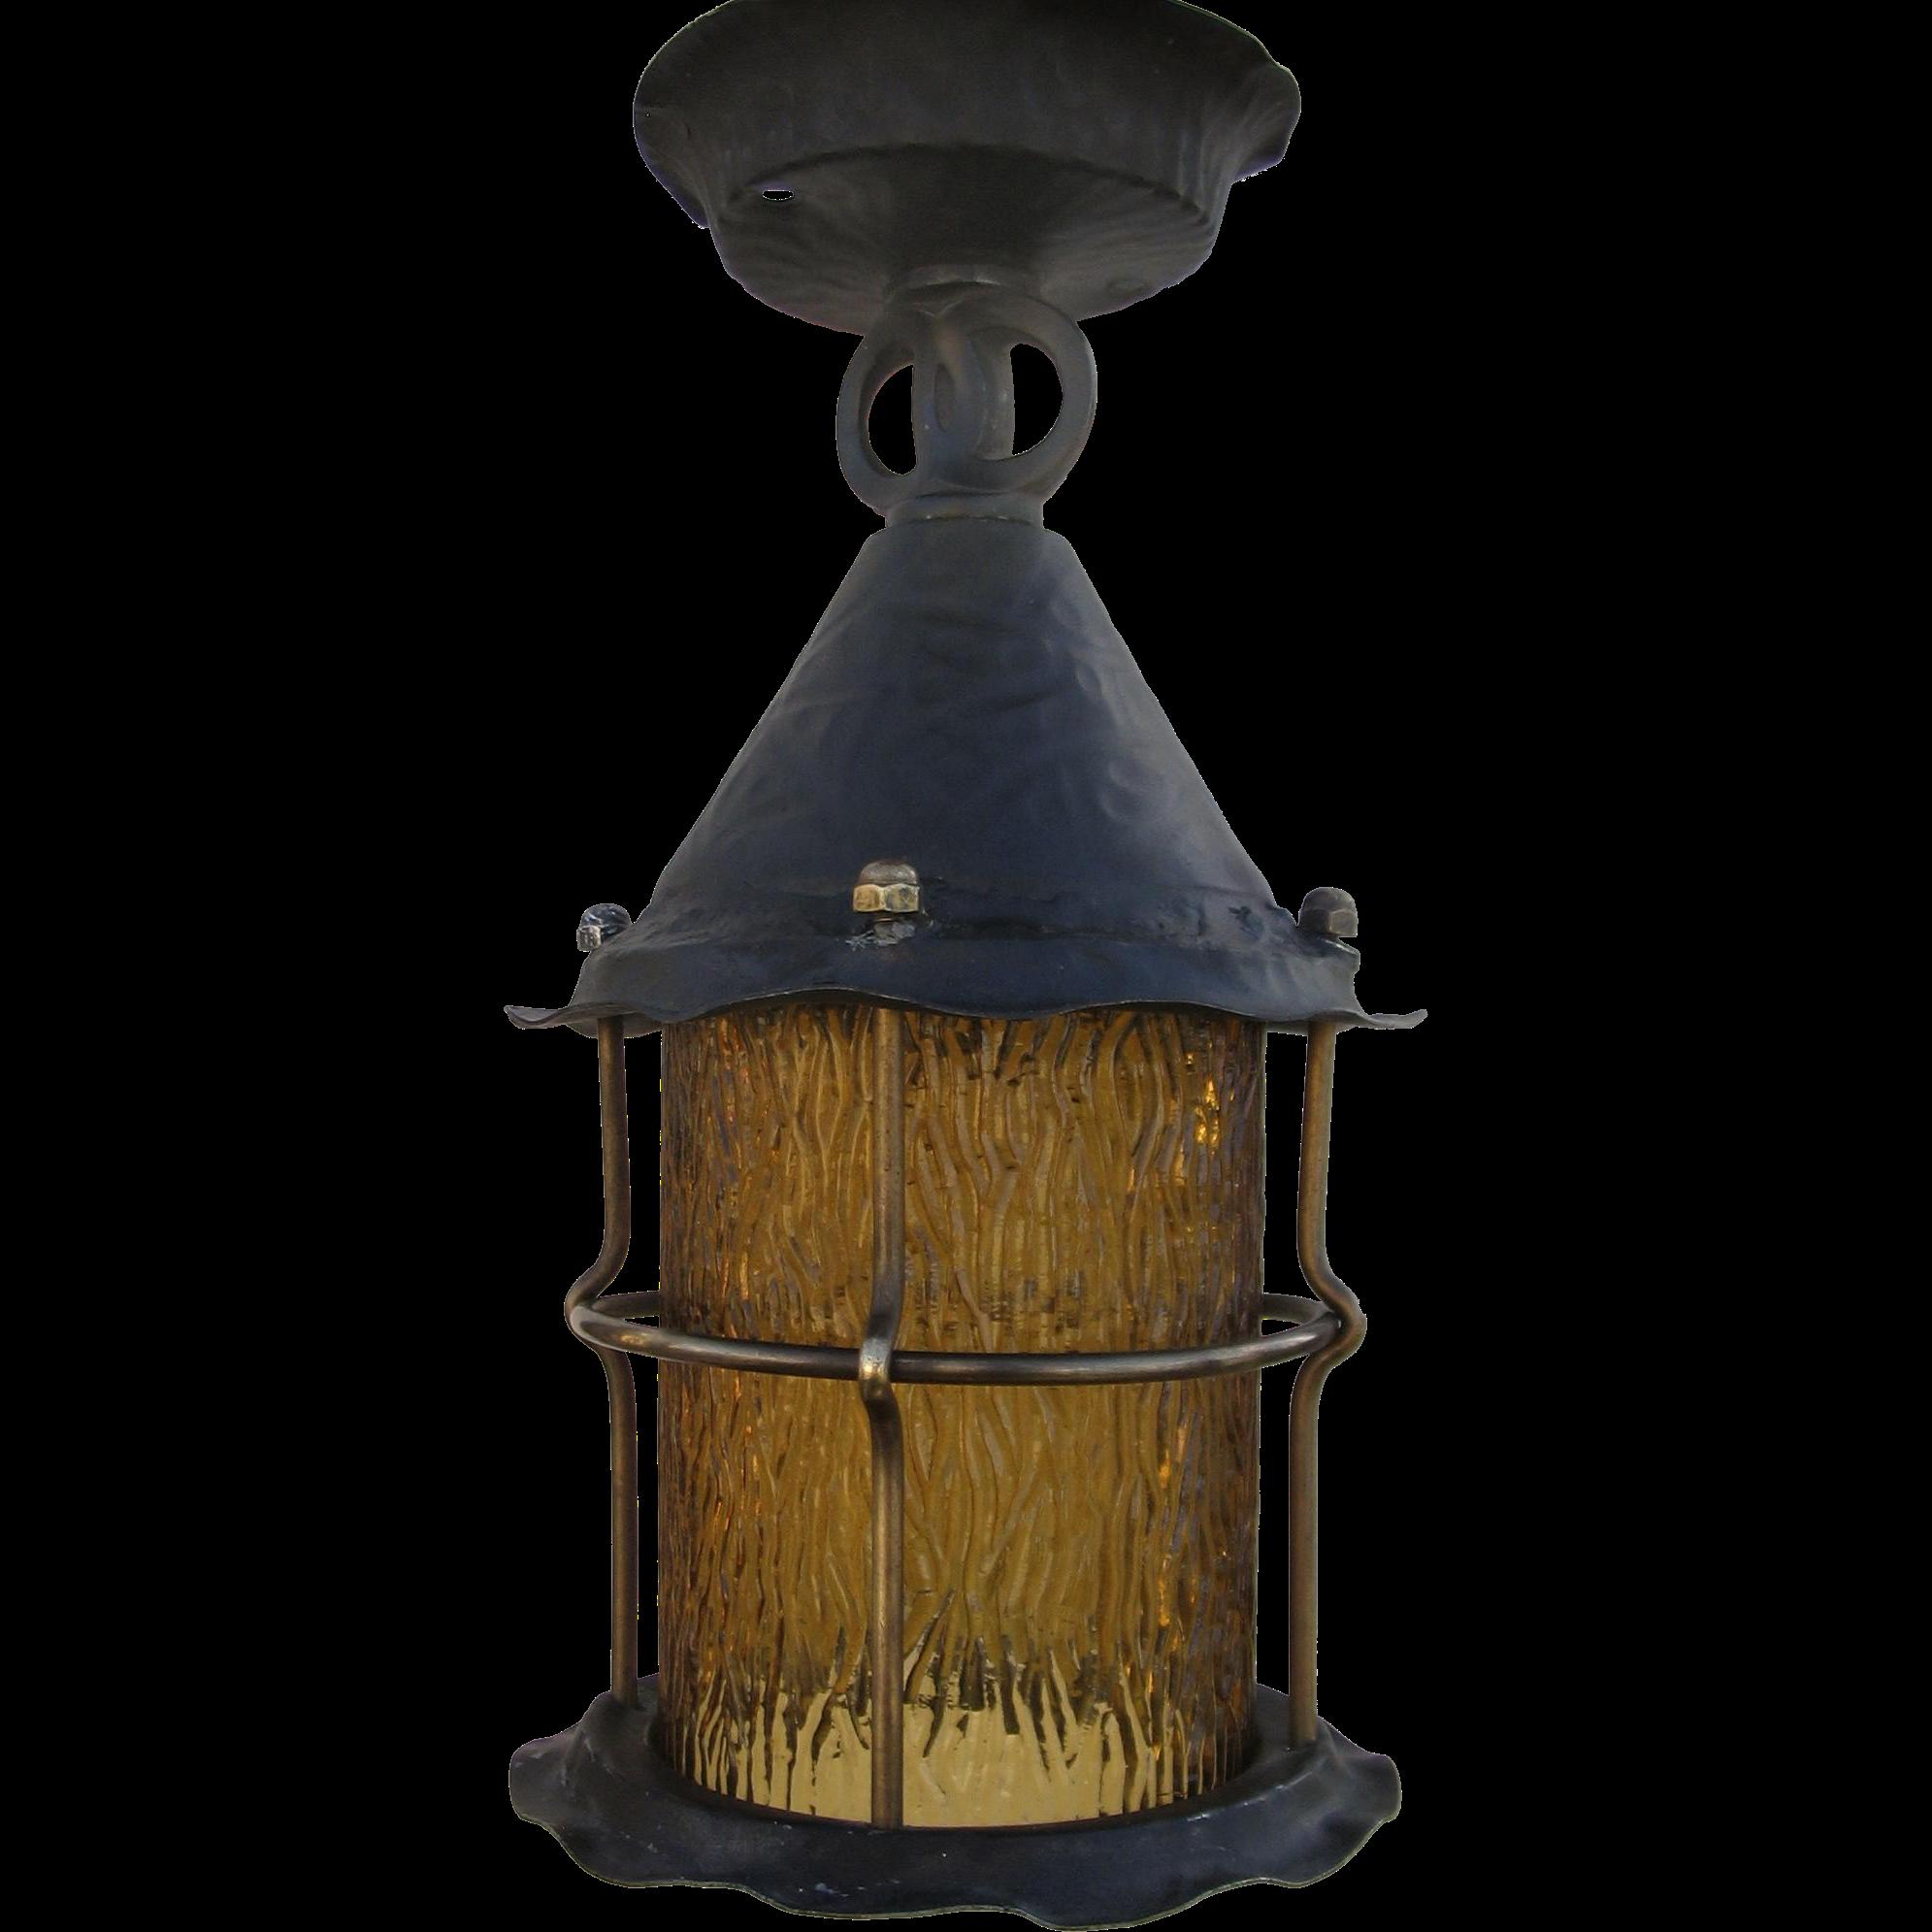 Porch Light Denver: 1920's Amber Glass Lantern Porch Hanging Light Chandelier